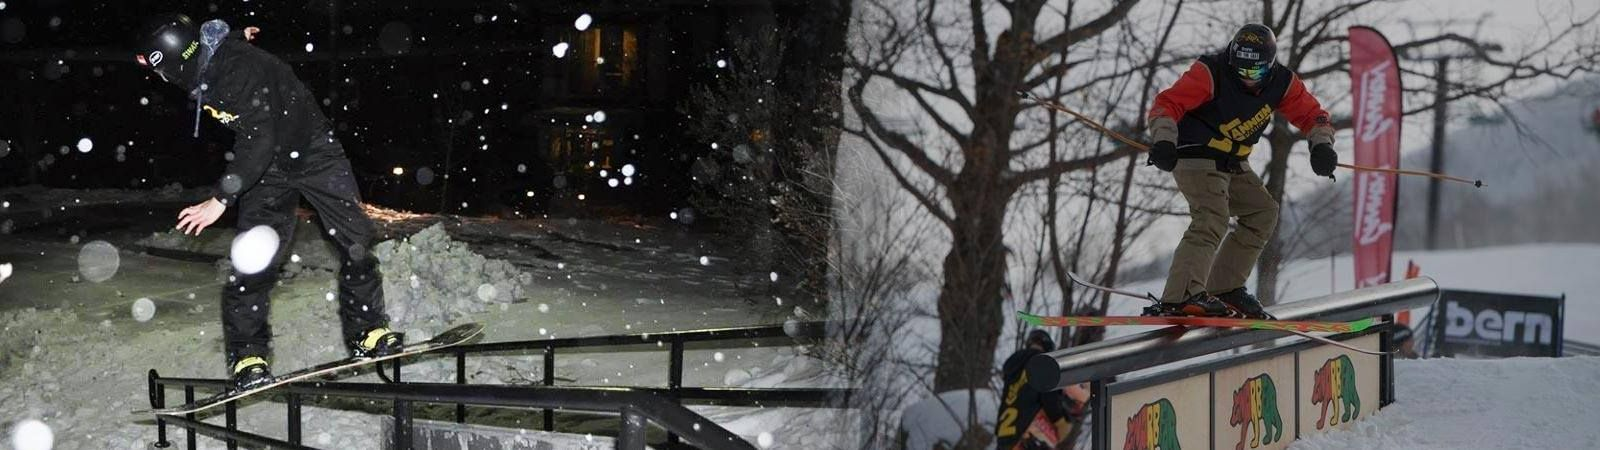 rails gnarbear street snowboarding skiing aiden chmura cannon mountain rail backyard